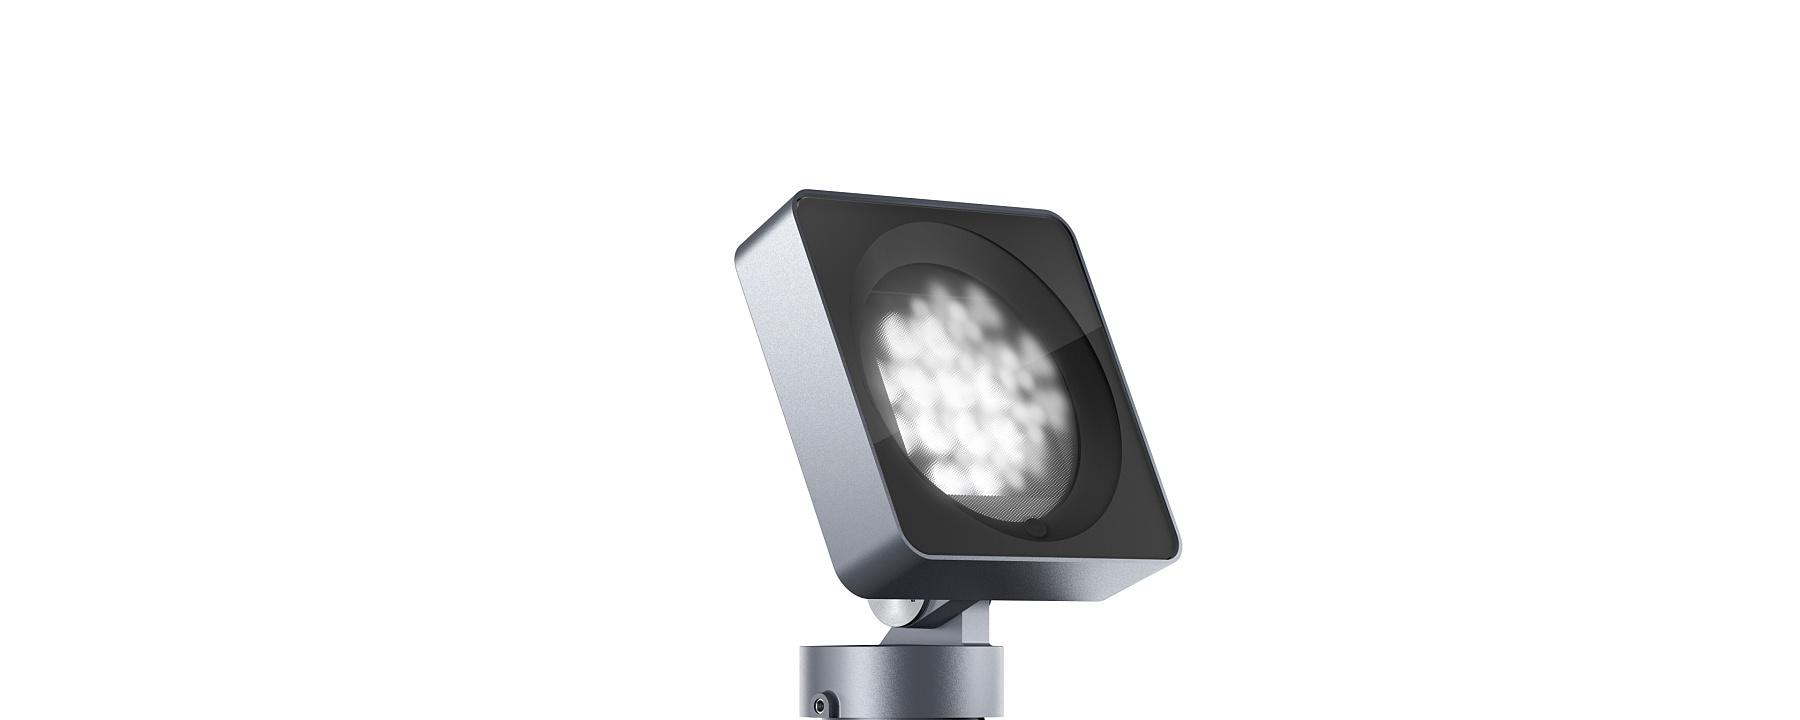 Lightscan